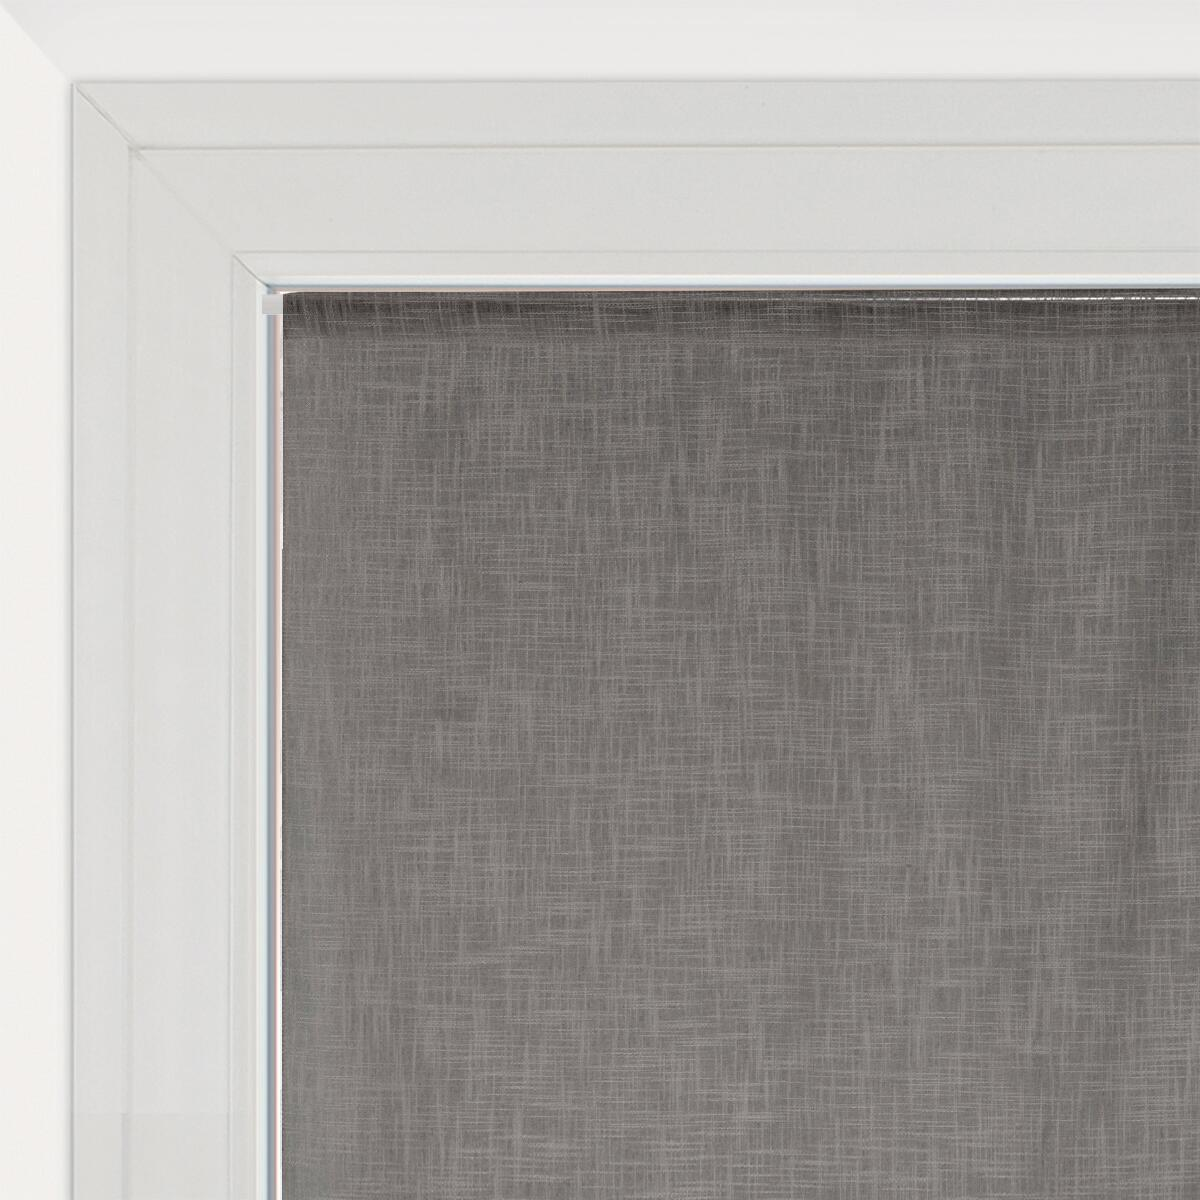 Tendina vetro Infini grigio tunnel 60 x 120 cm - 1